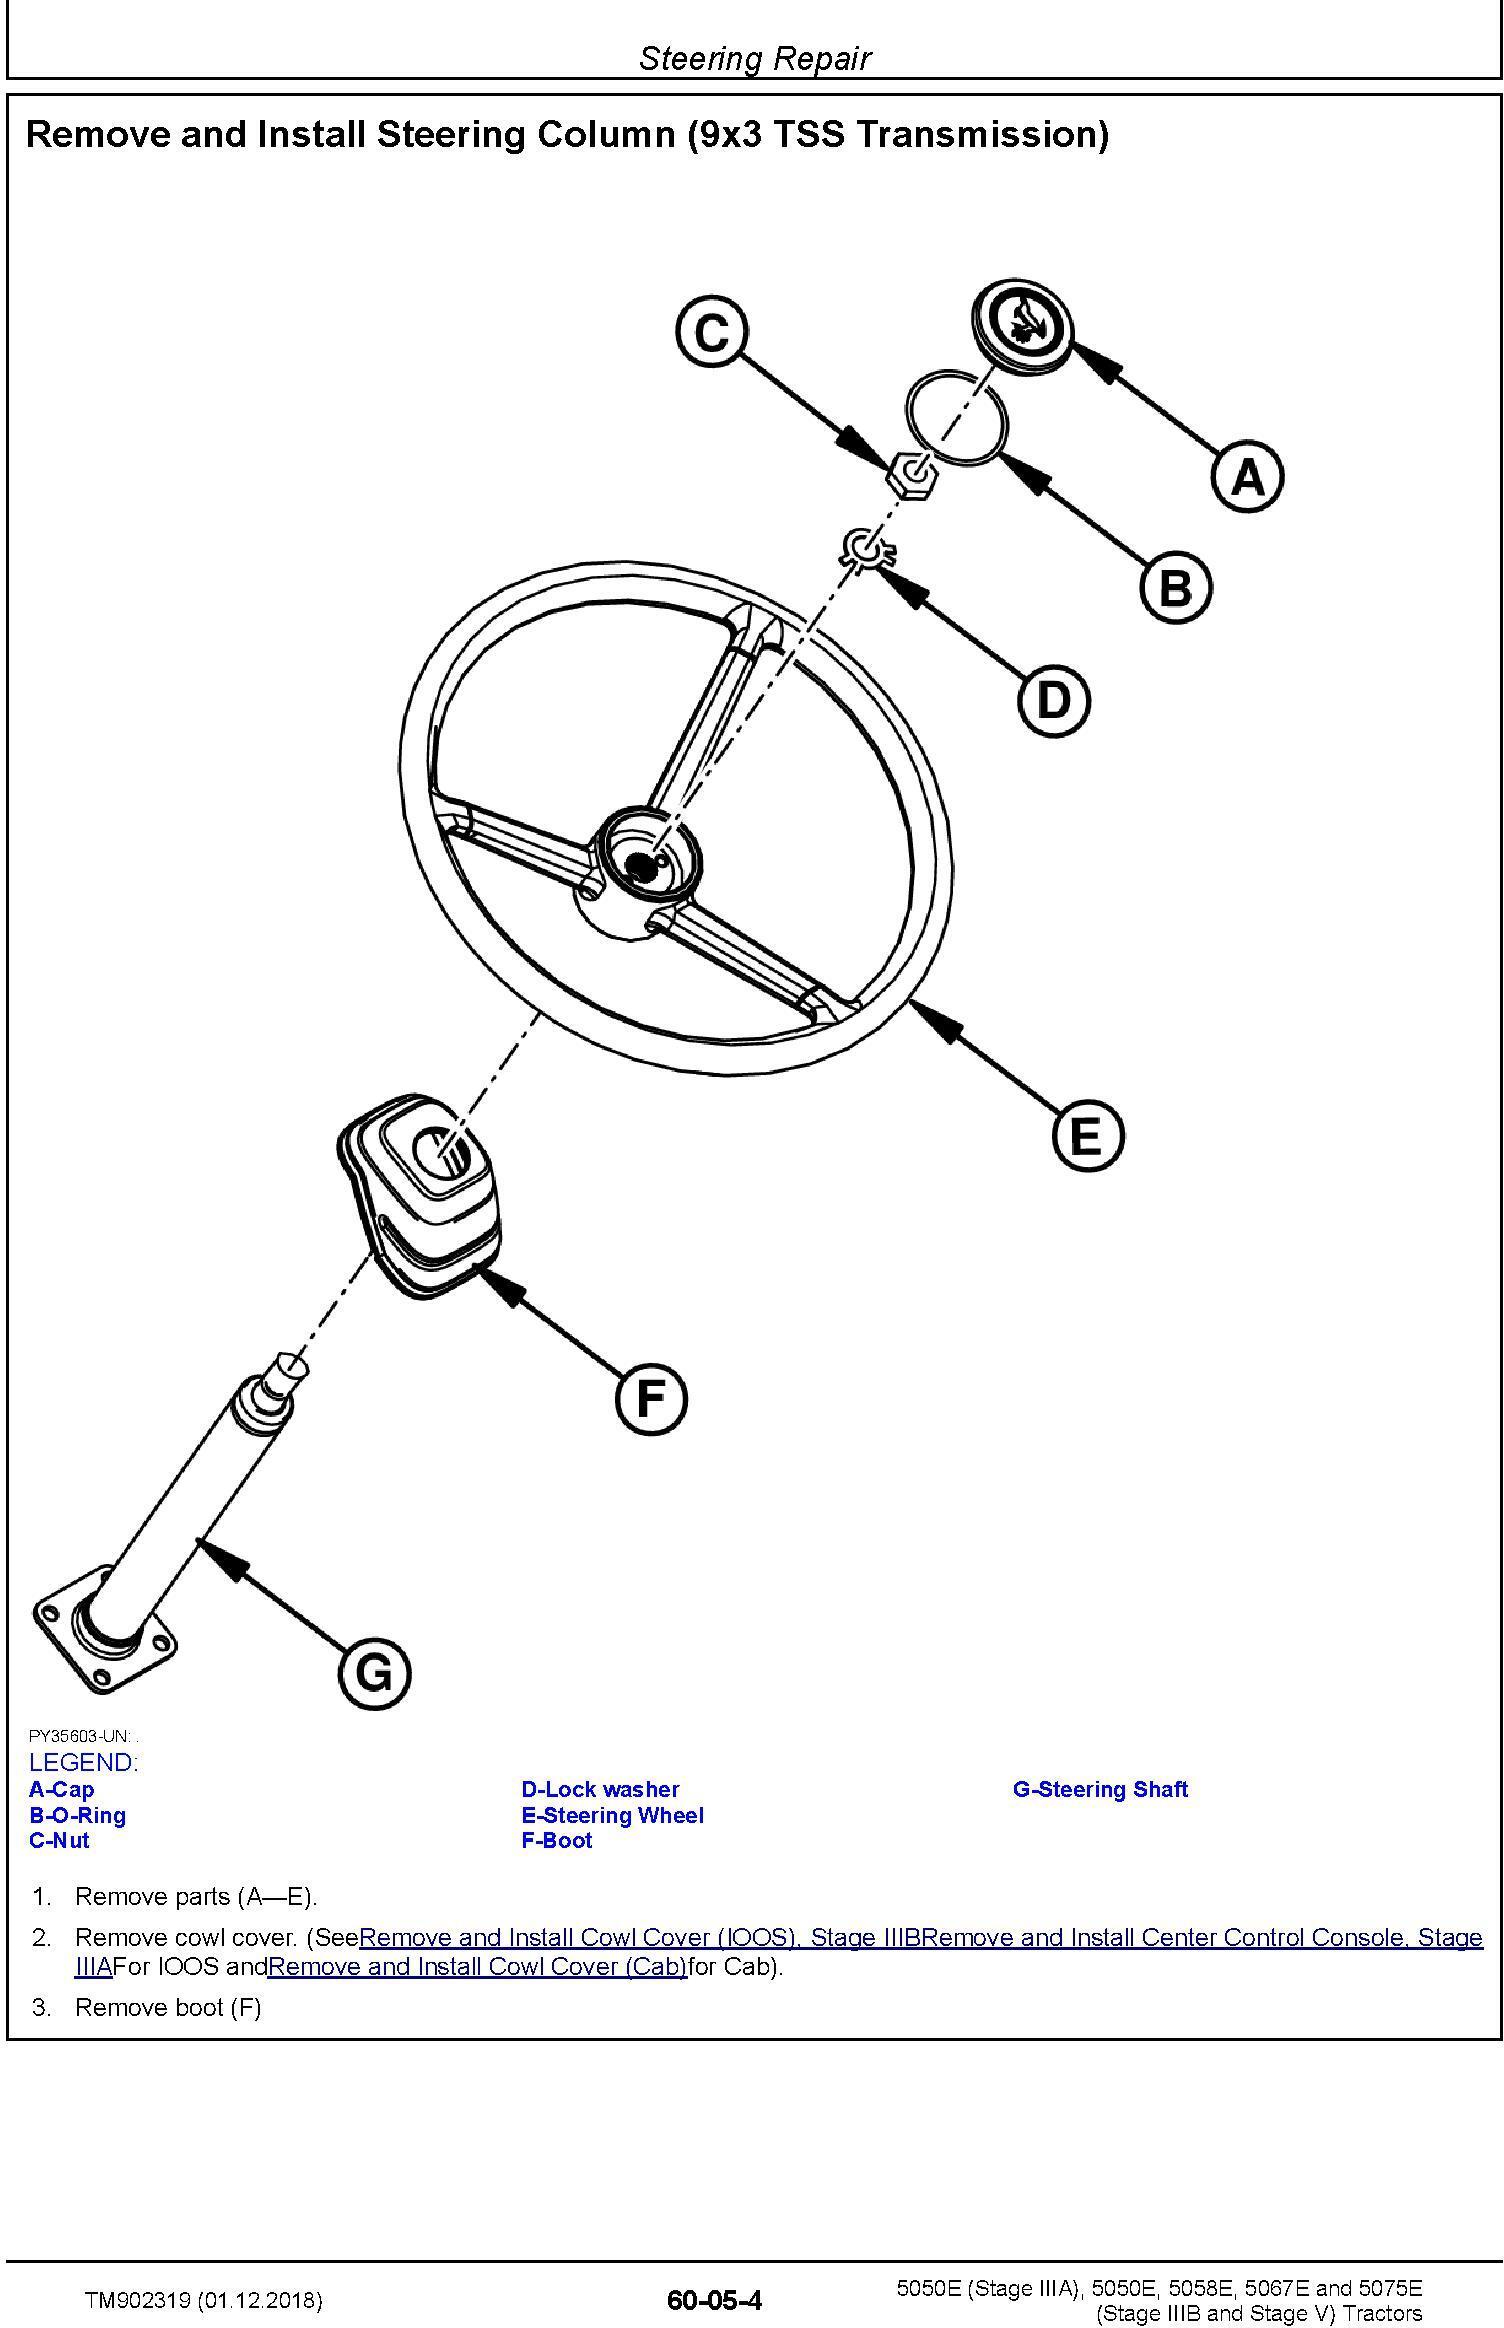 John Deere 5050E, 5050E, 5058E, 5067E, 5075E Tractors Service Repair Technical Manual (TM902319) - 3